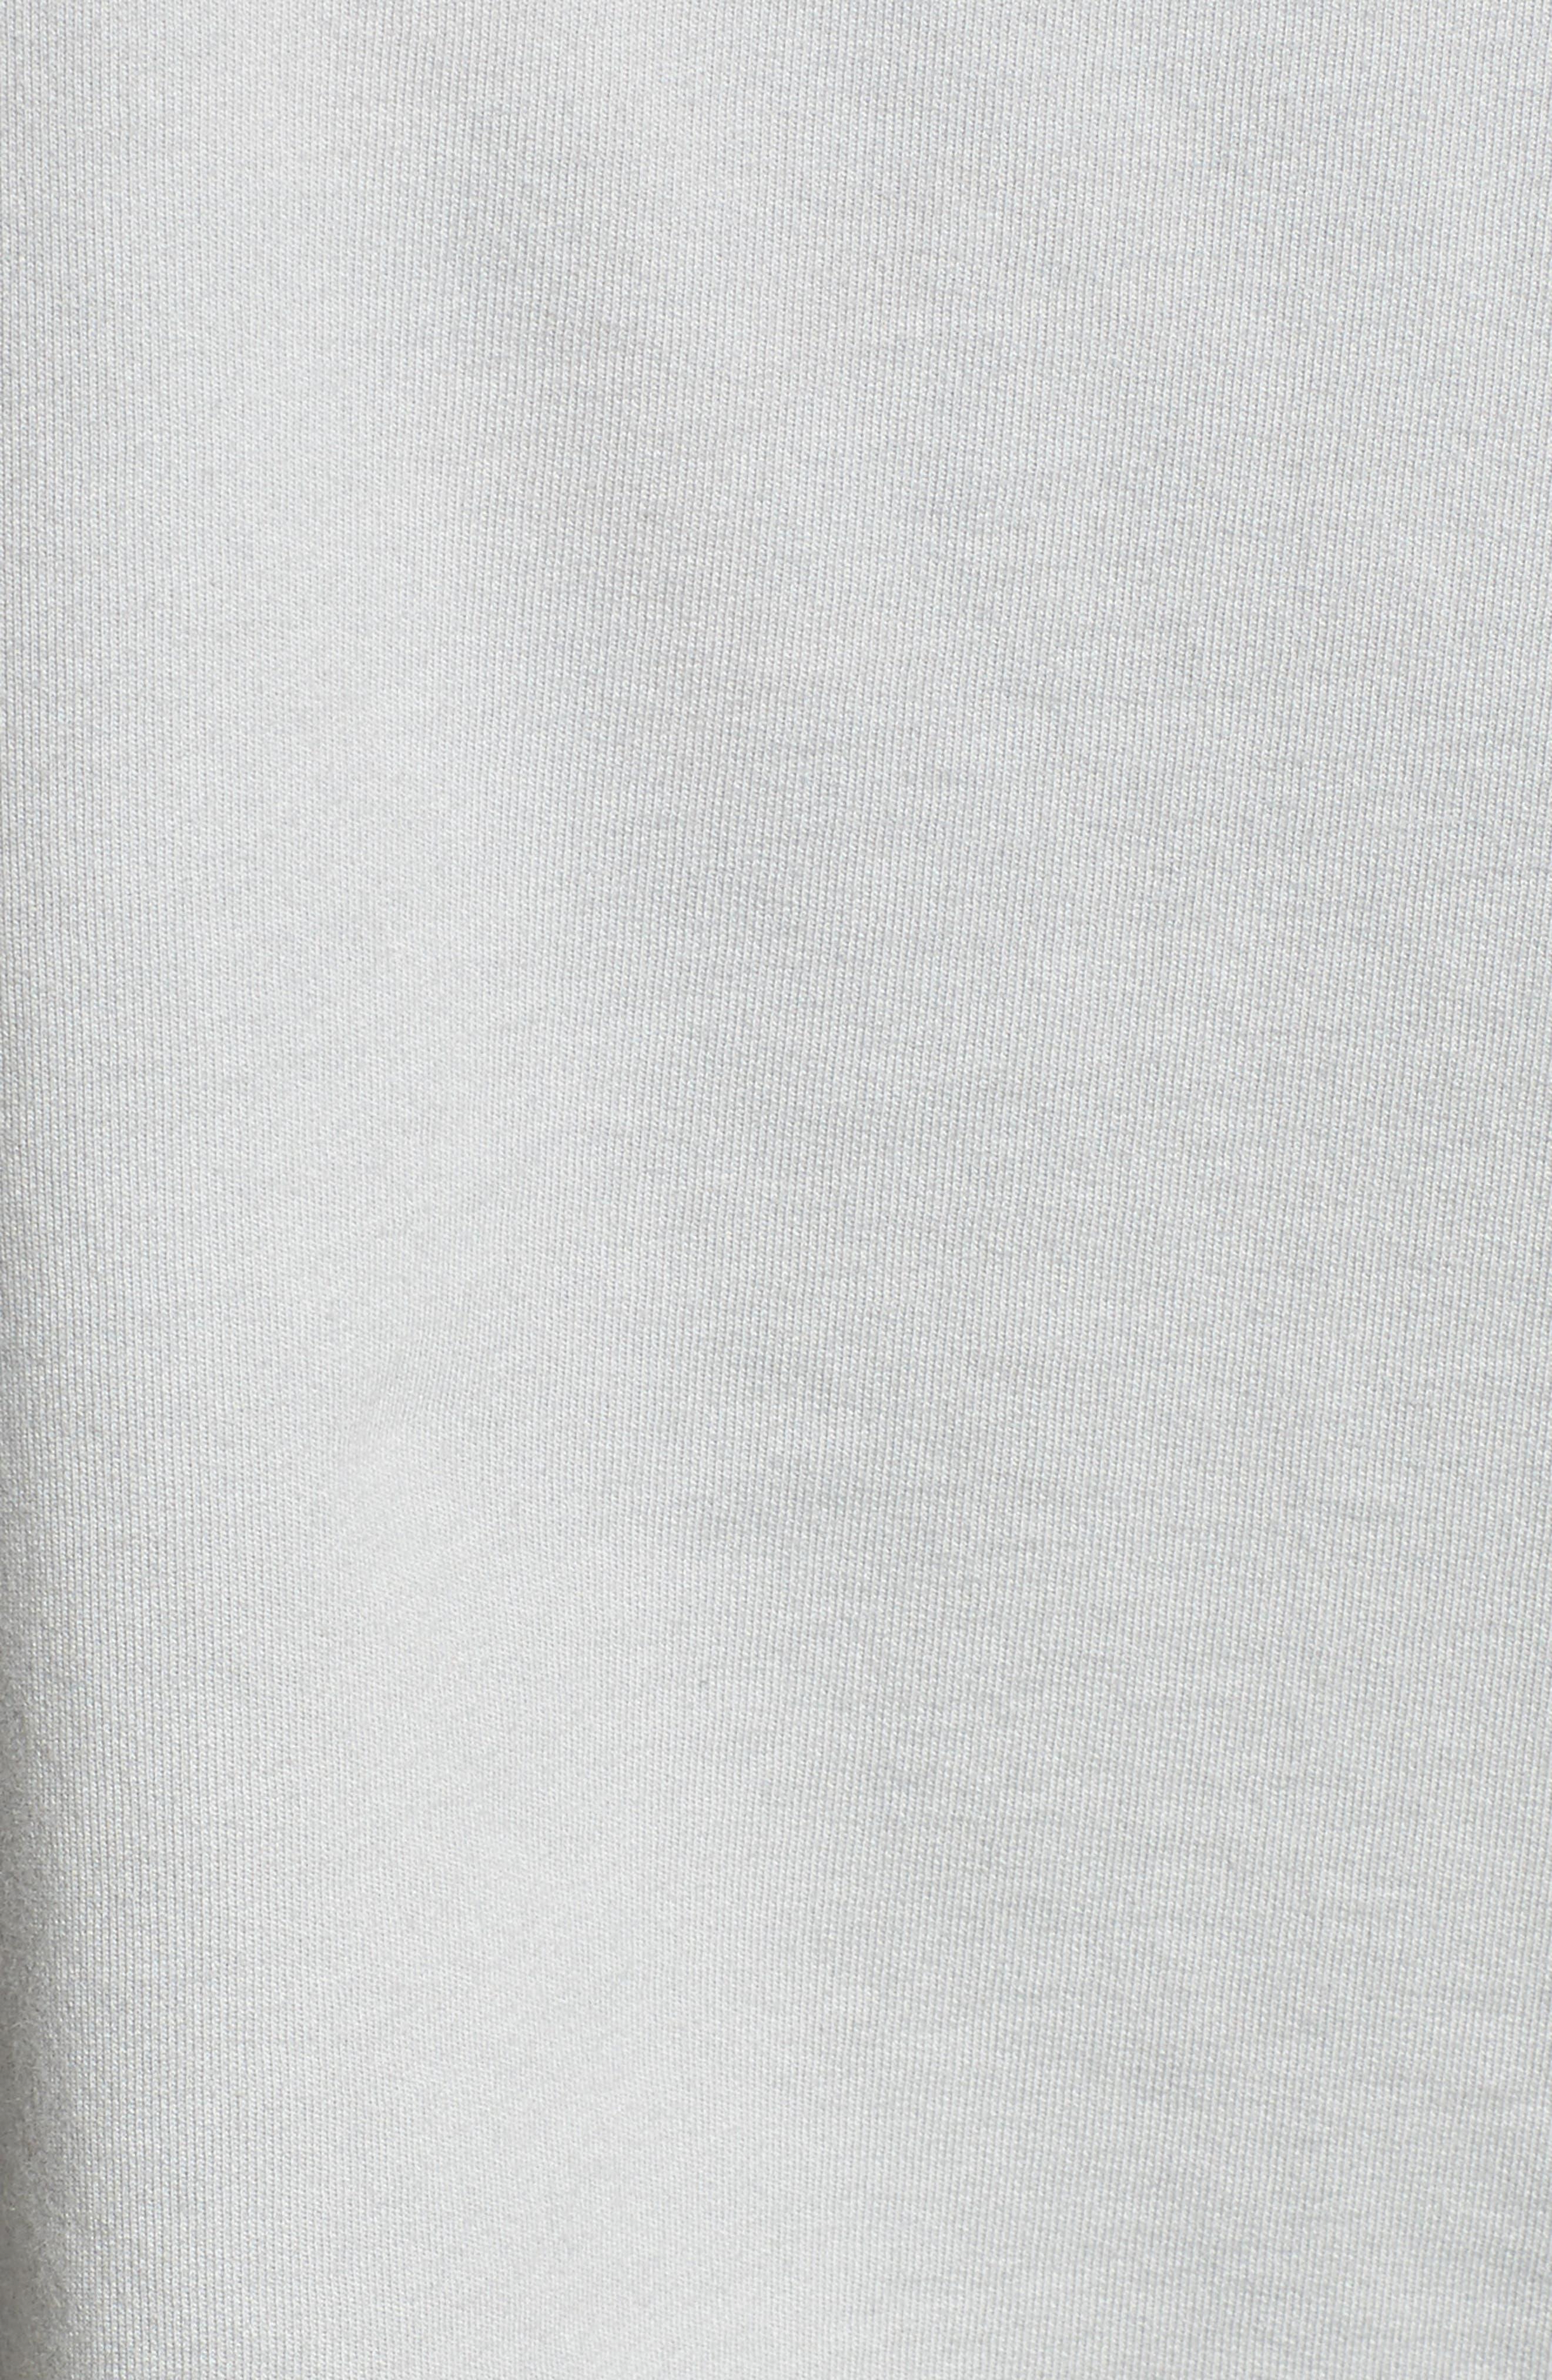 Sleigh Whaaat Sweatshirt,                             Alternate thumbnail 5, color,                             020